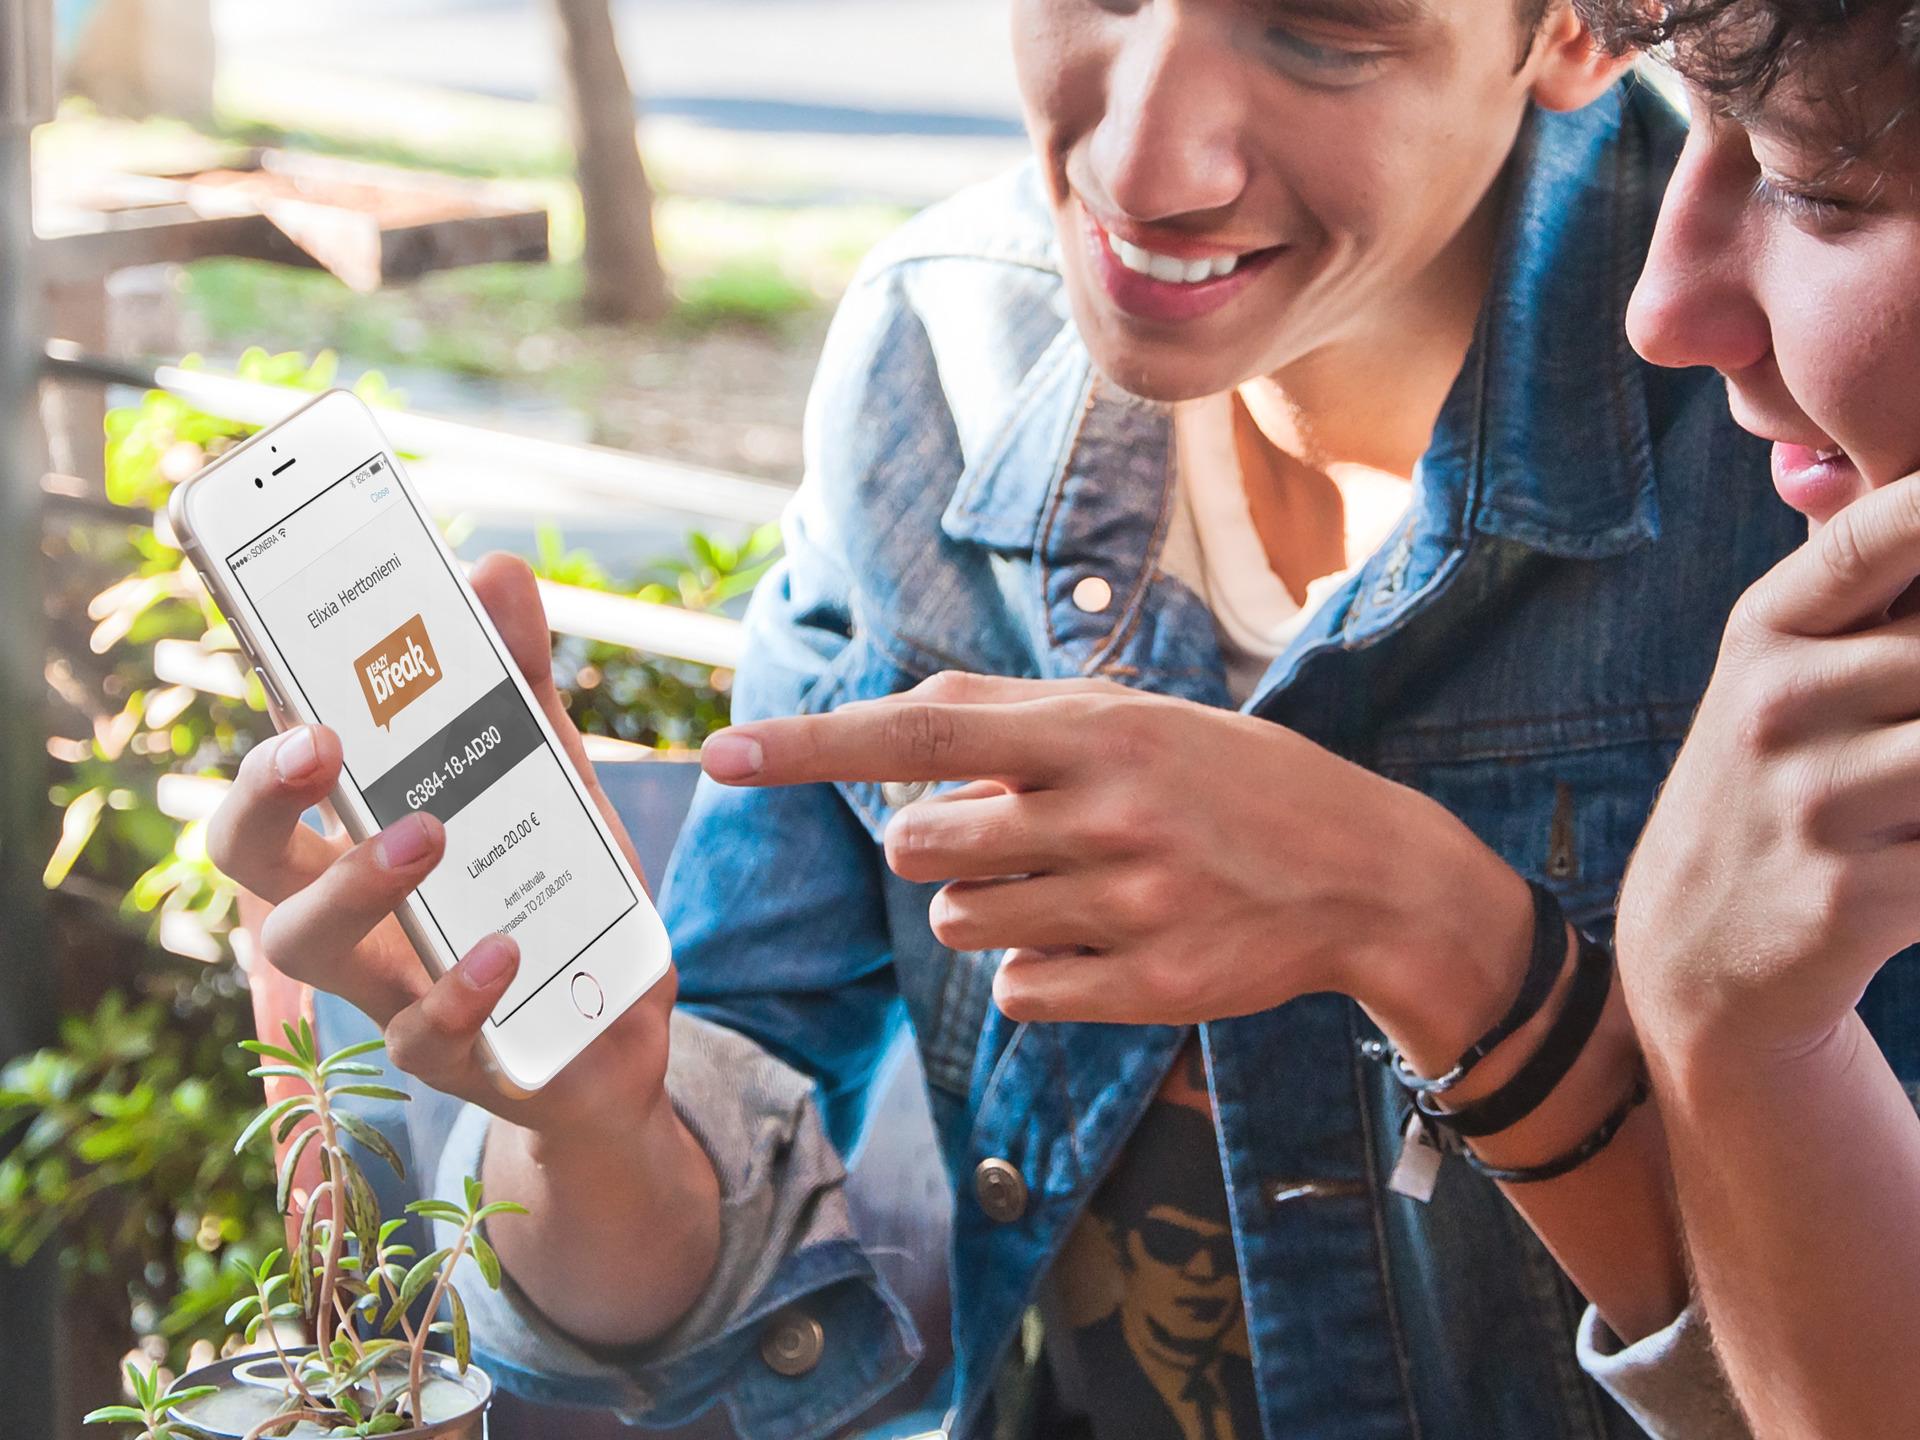 Eazybreak - liikunta- ja kulttuuriseteli mobiilipalveluna